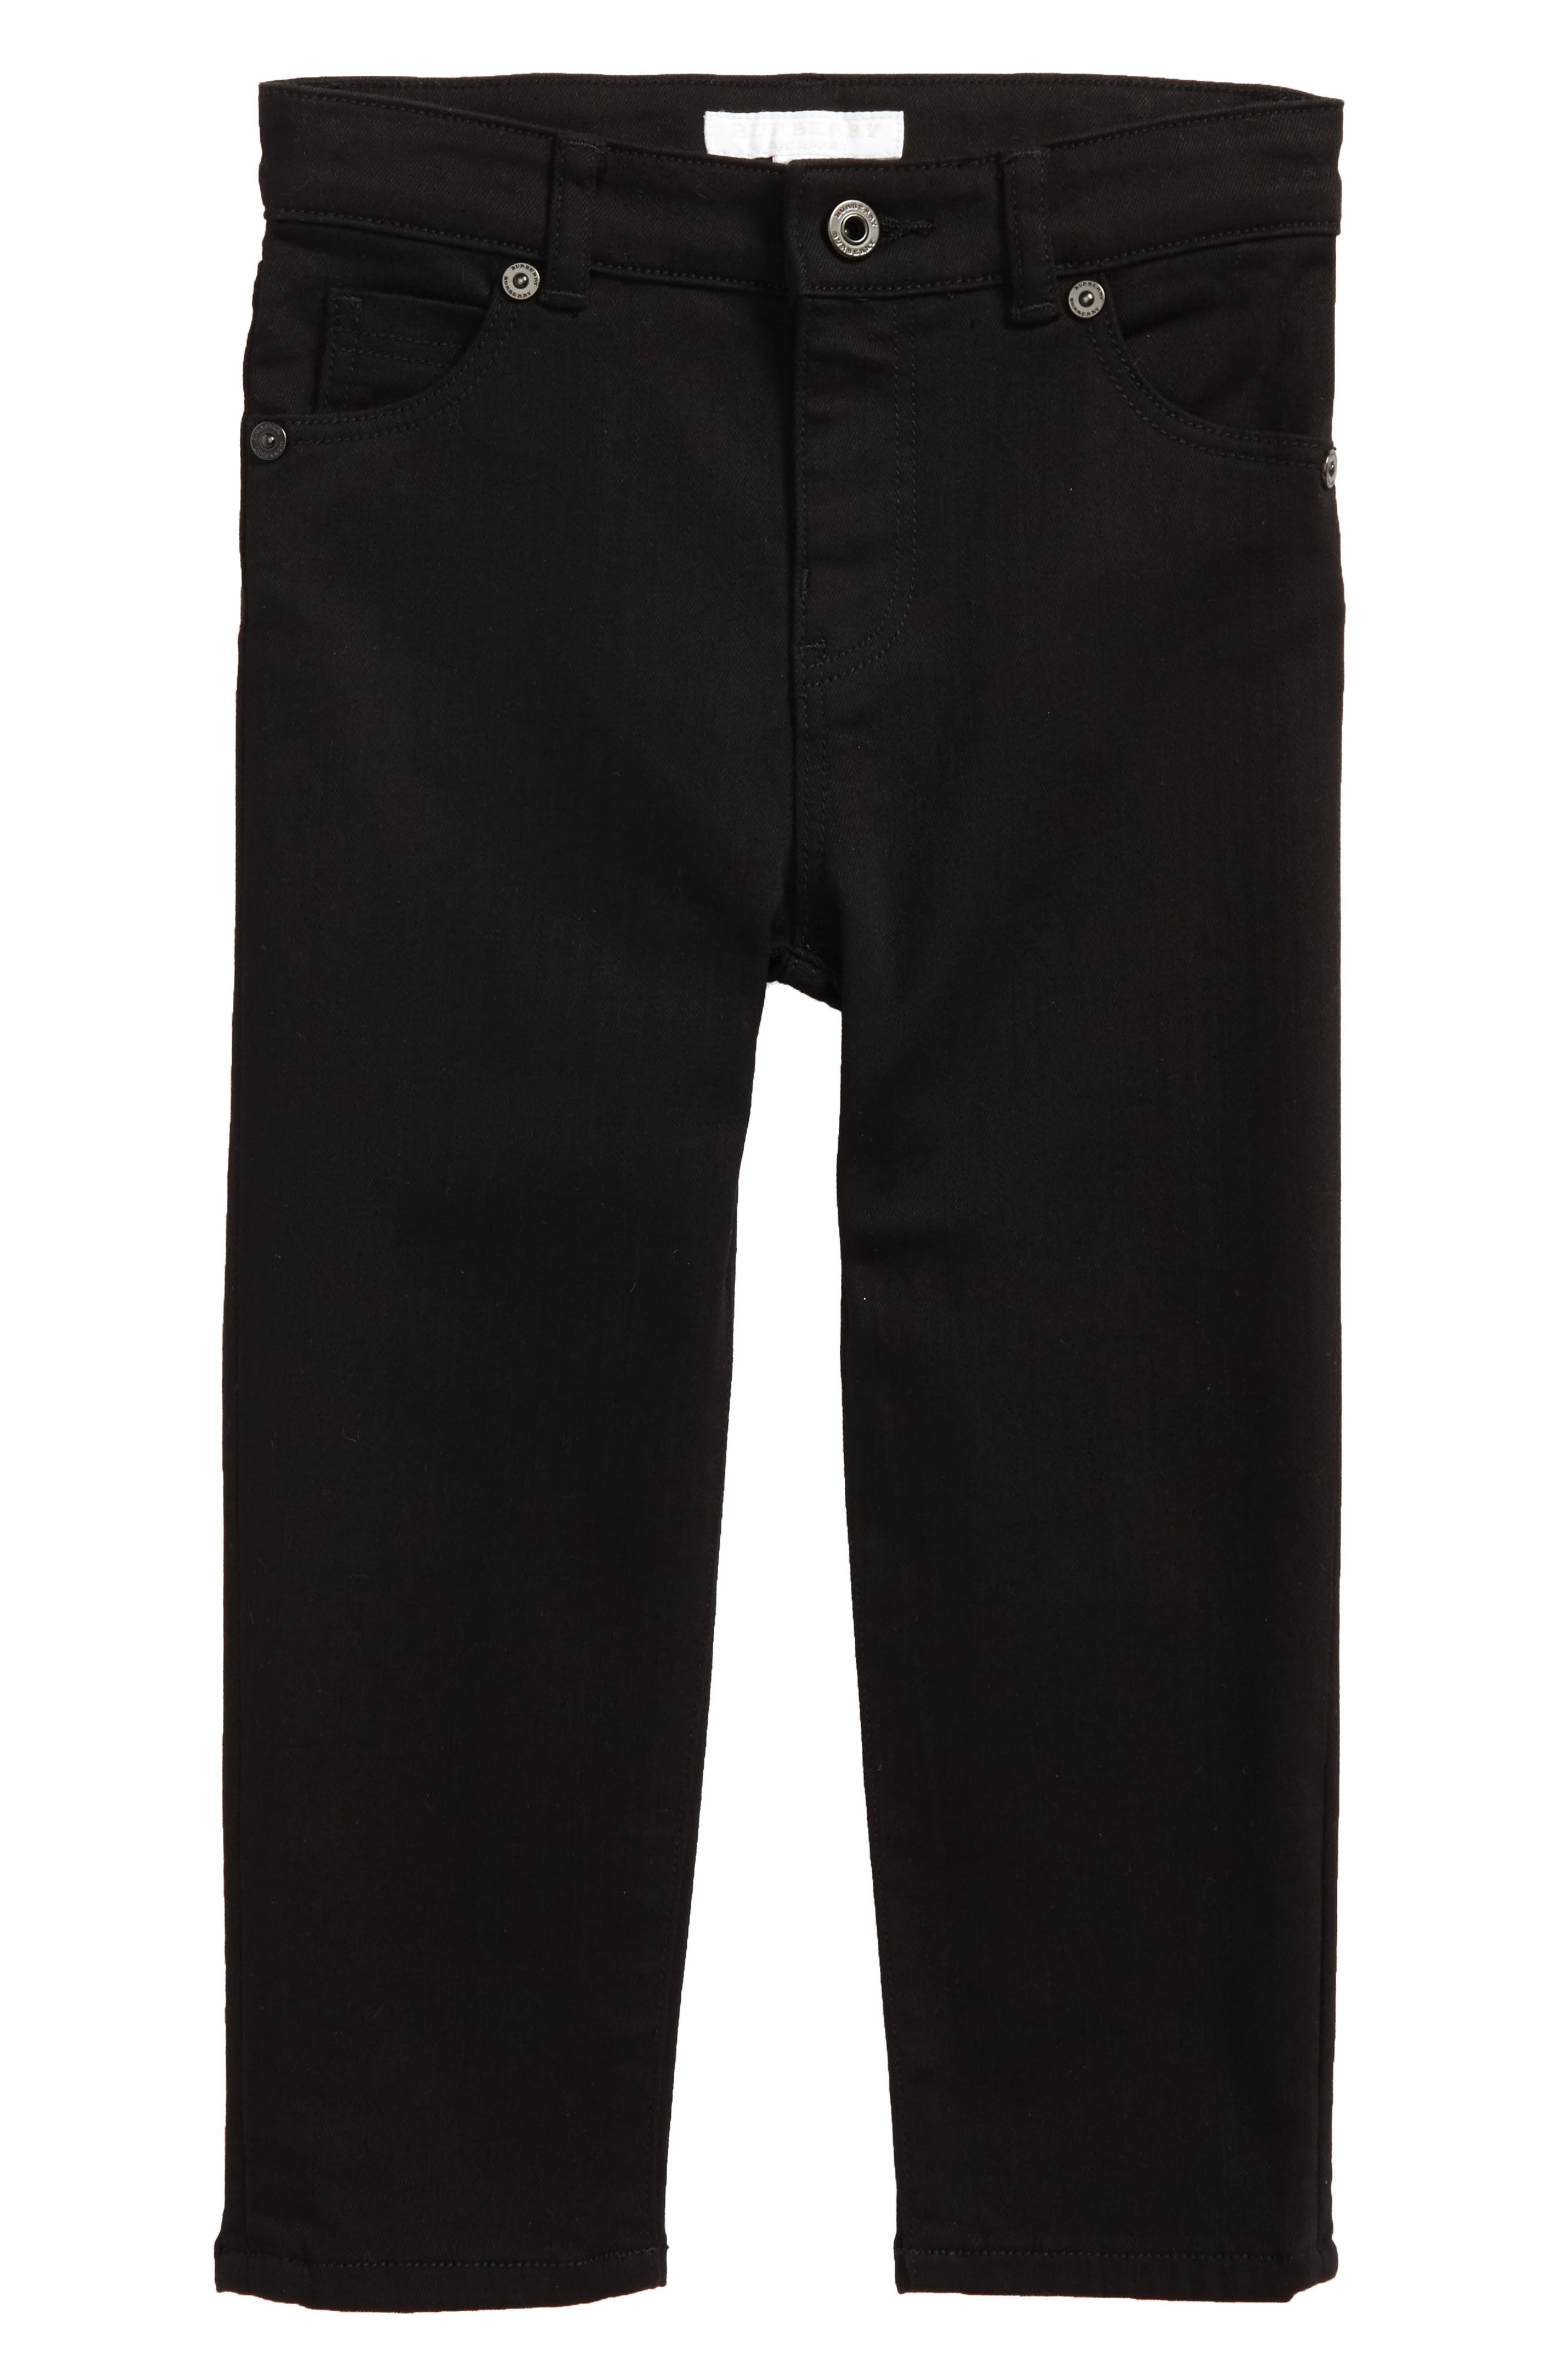 Main Image - Burberry Skinny Jeans (Toddler Boys, Little Boys & Big Boys)